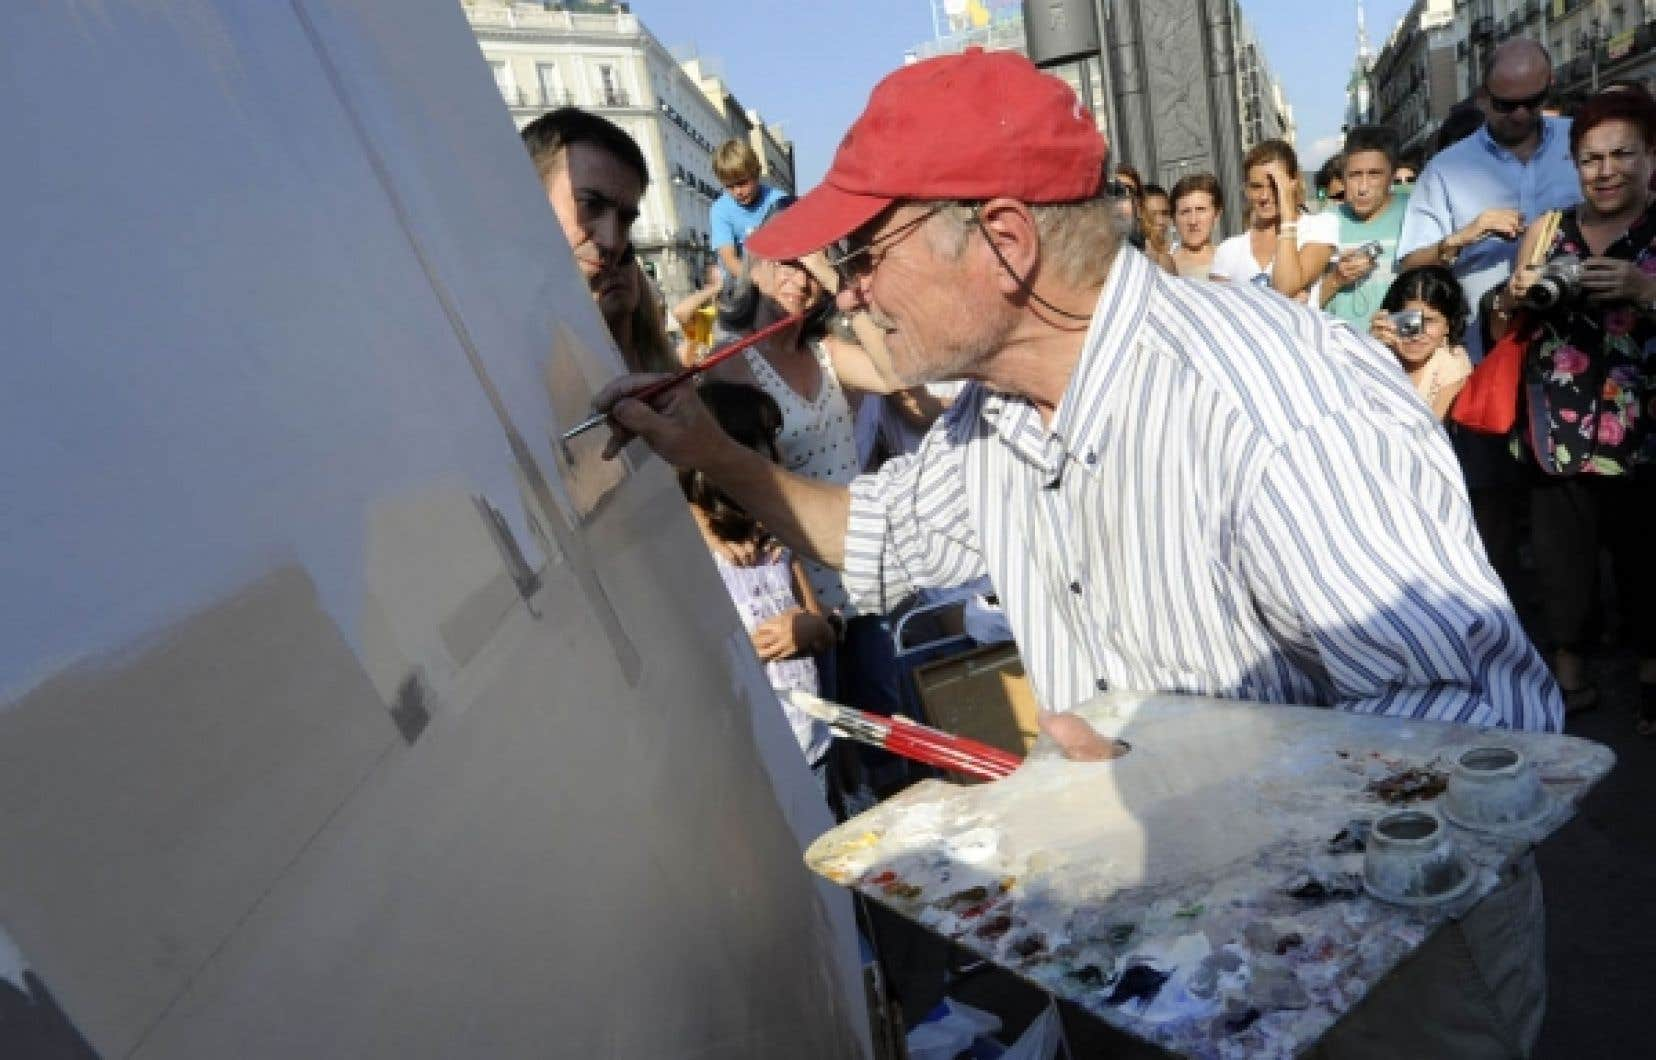 Le peintre antonio lopez montre son art sur la puerta del sol madrid le devoir - Autoescuela gala puerta del sol ...